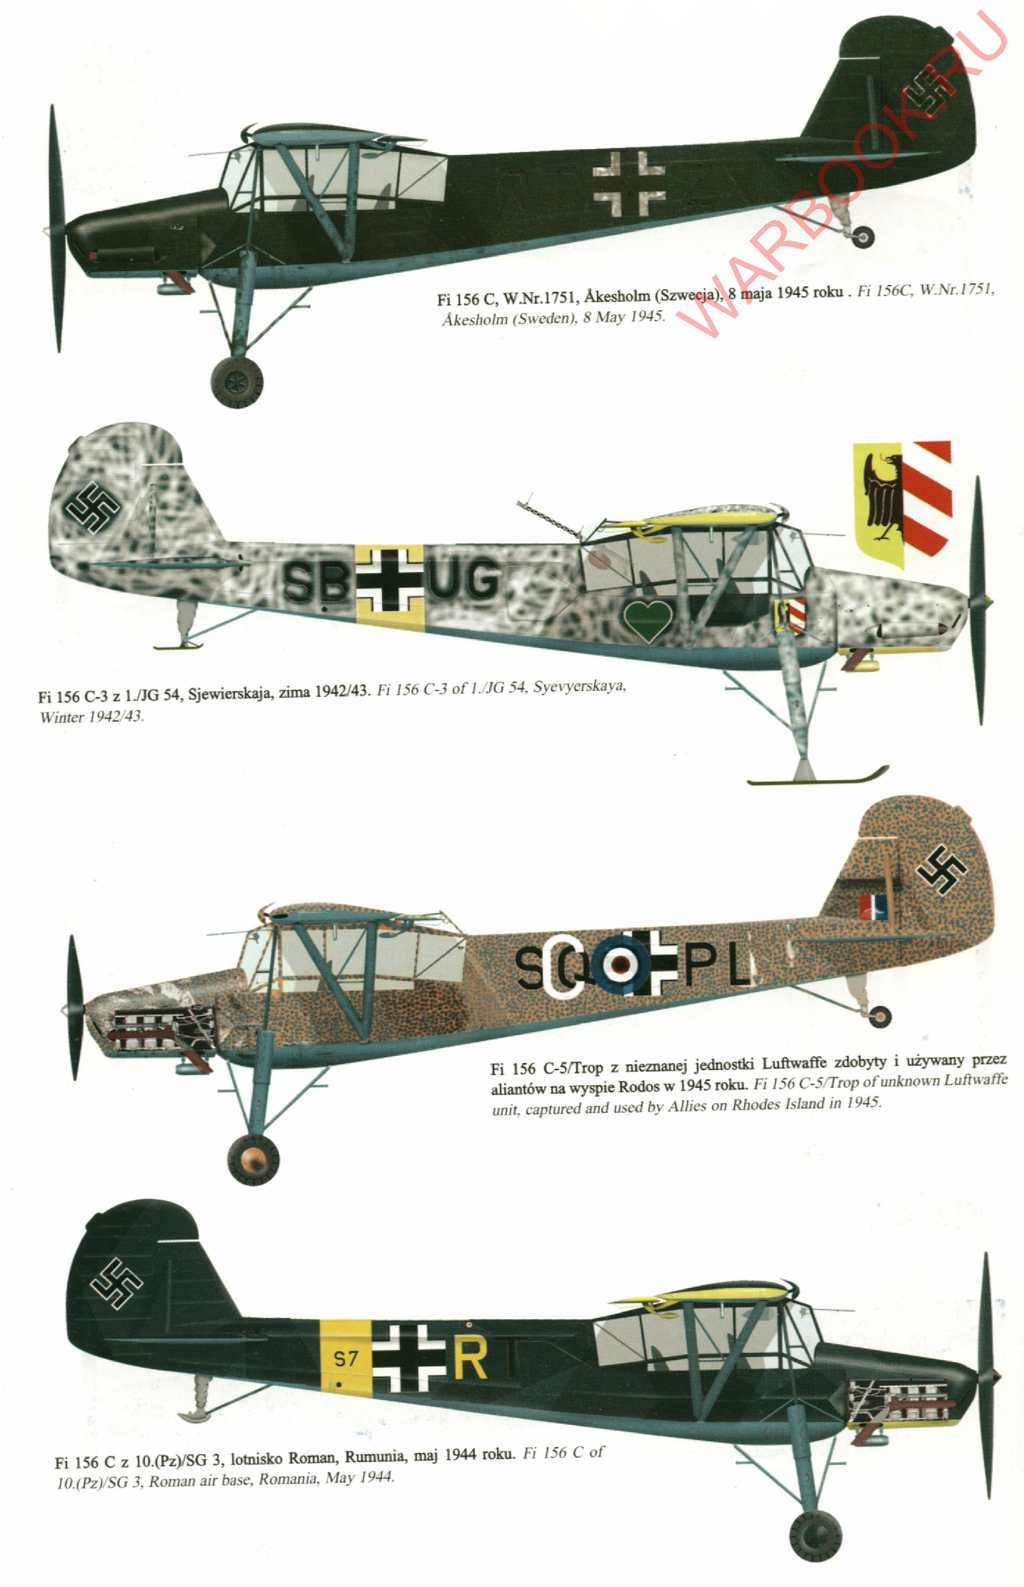 Fieseler Storch Fi 156 P74